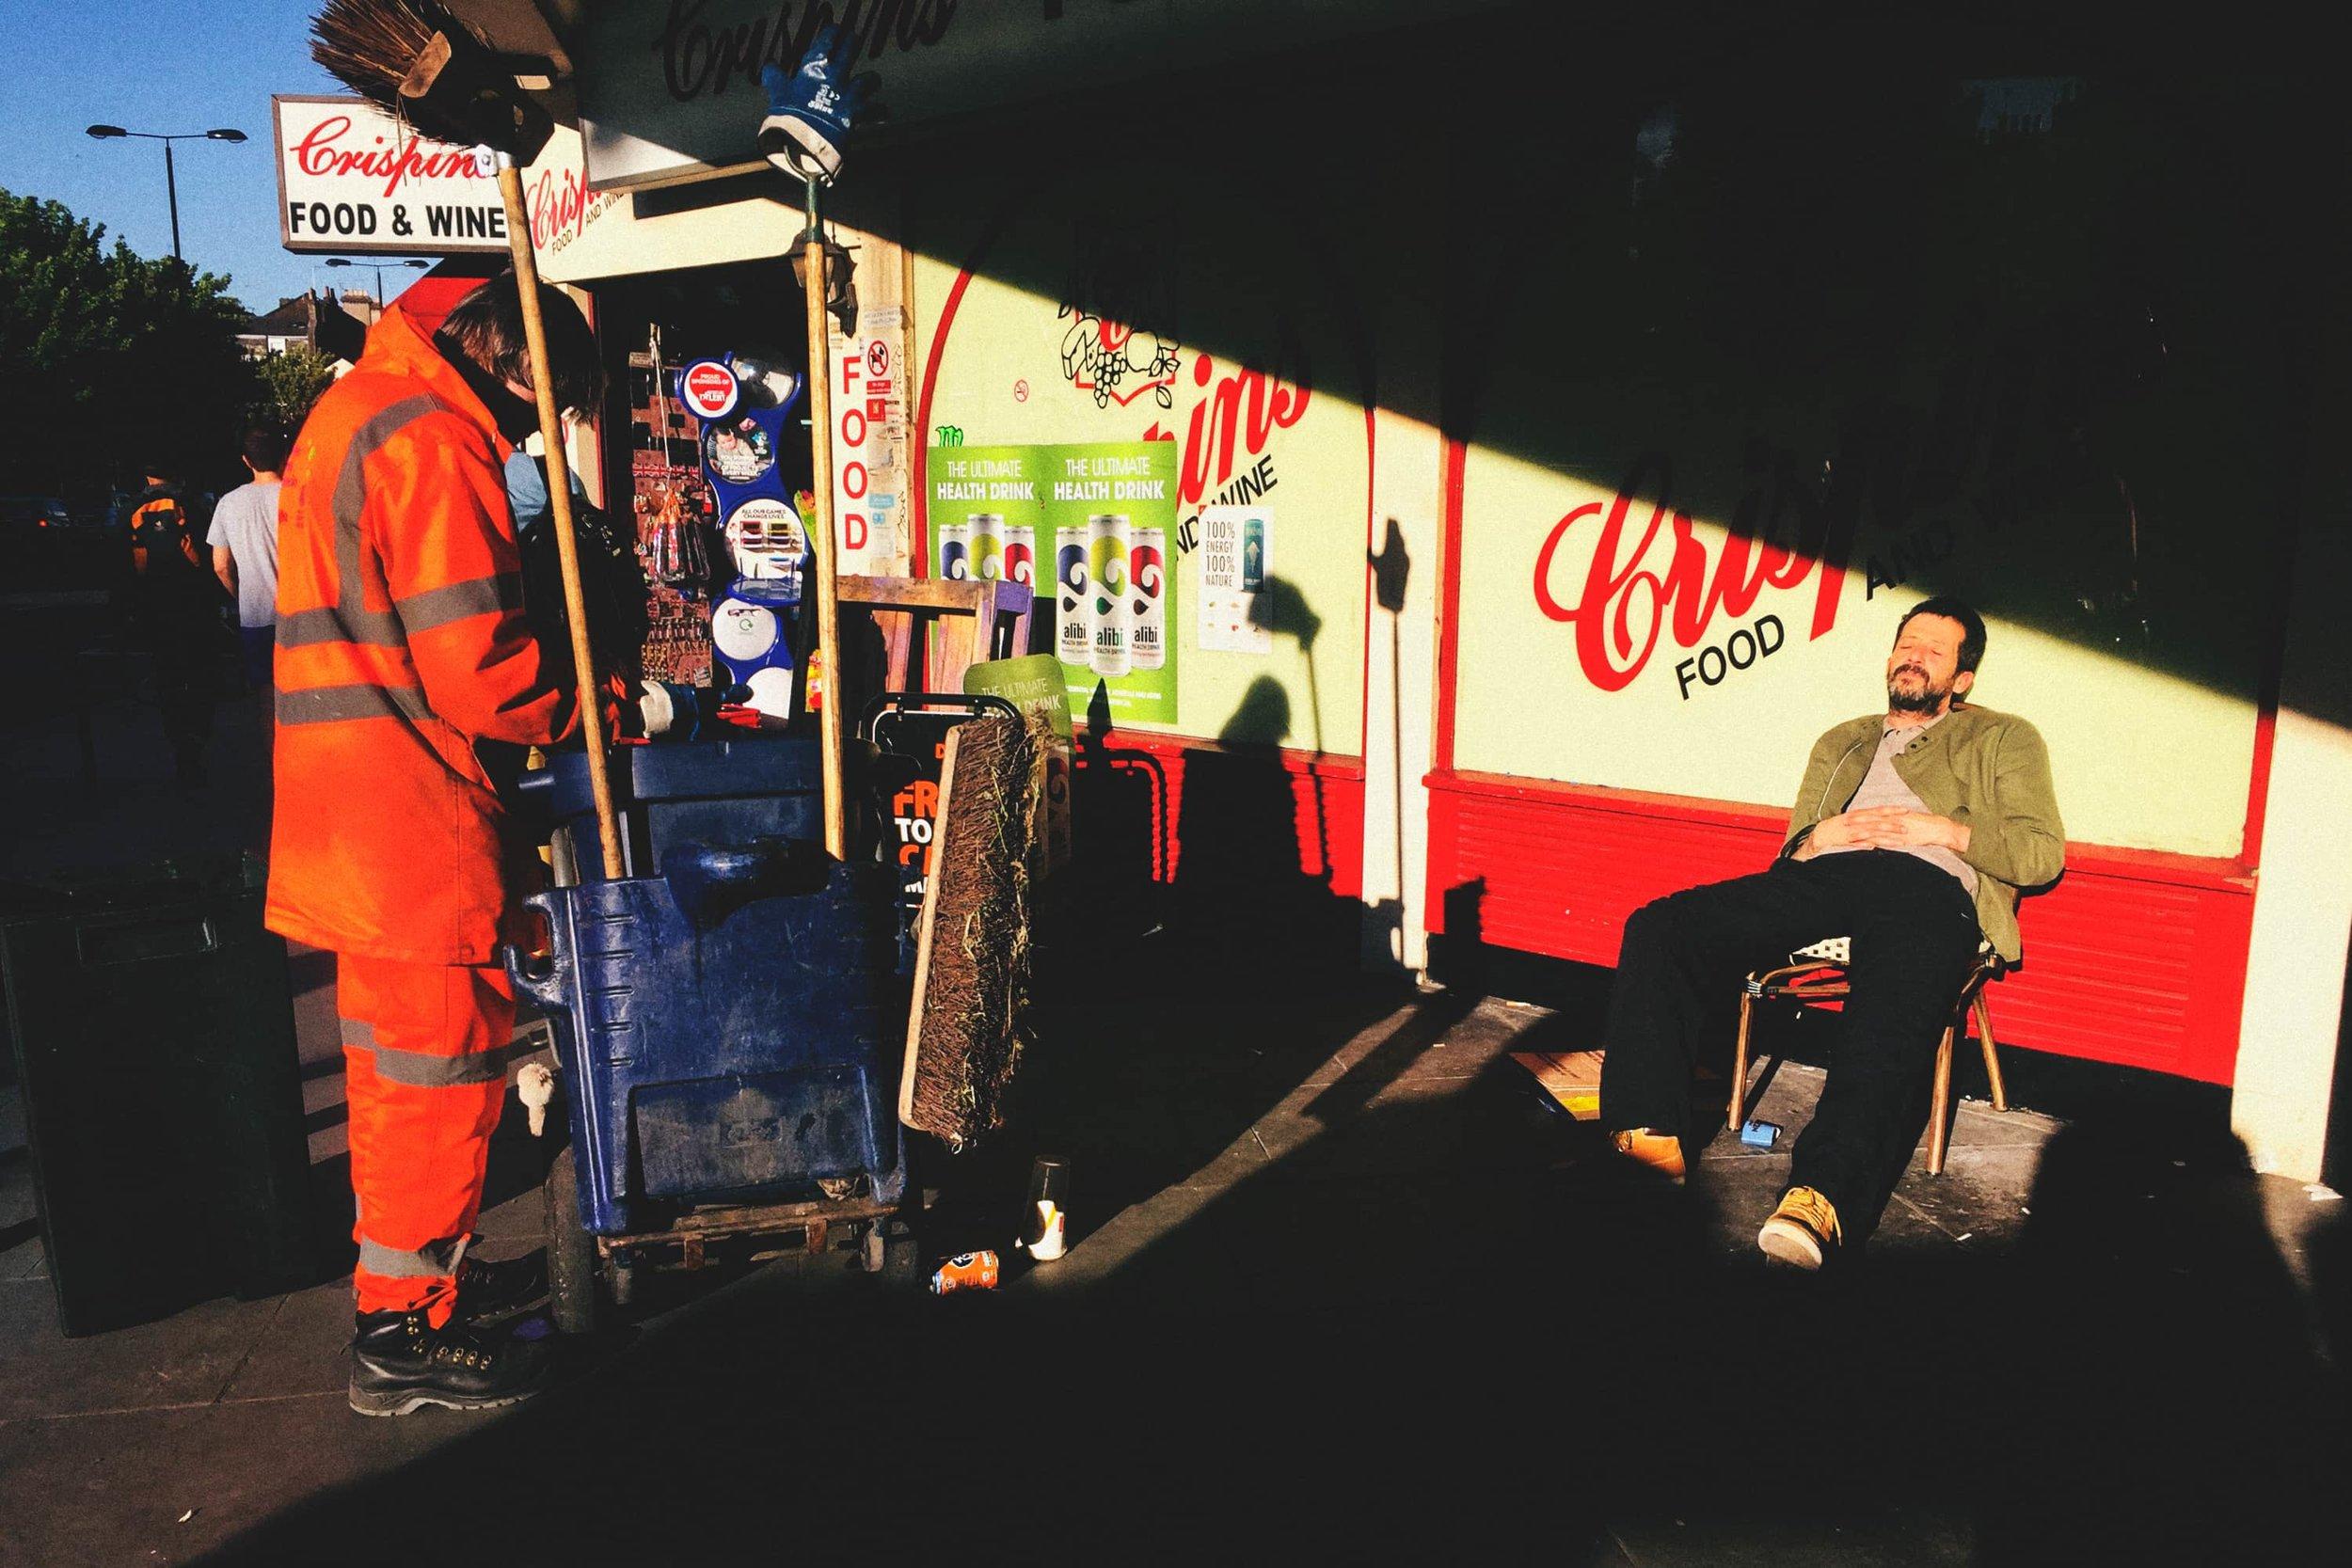 street-documentary-iphone-photography-fabio-burrelli-11.jpg